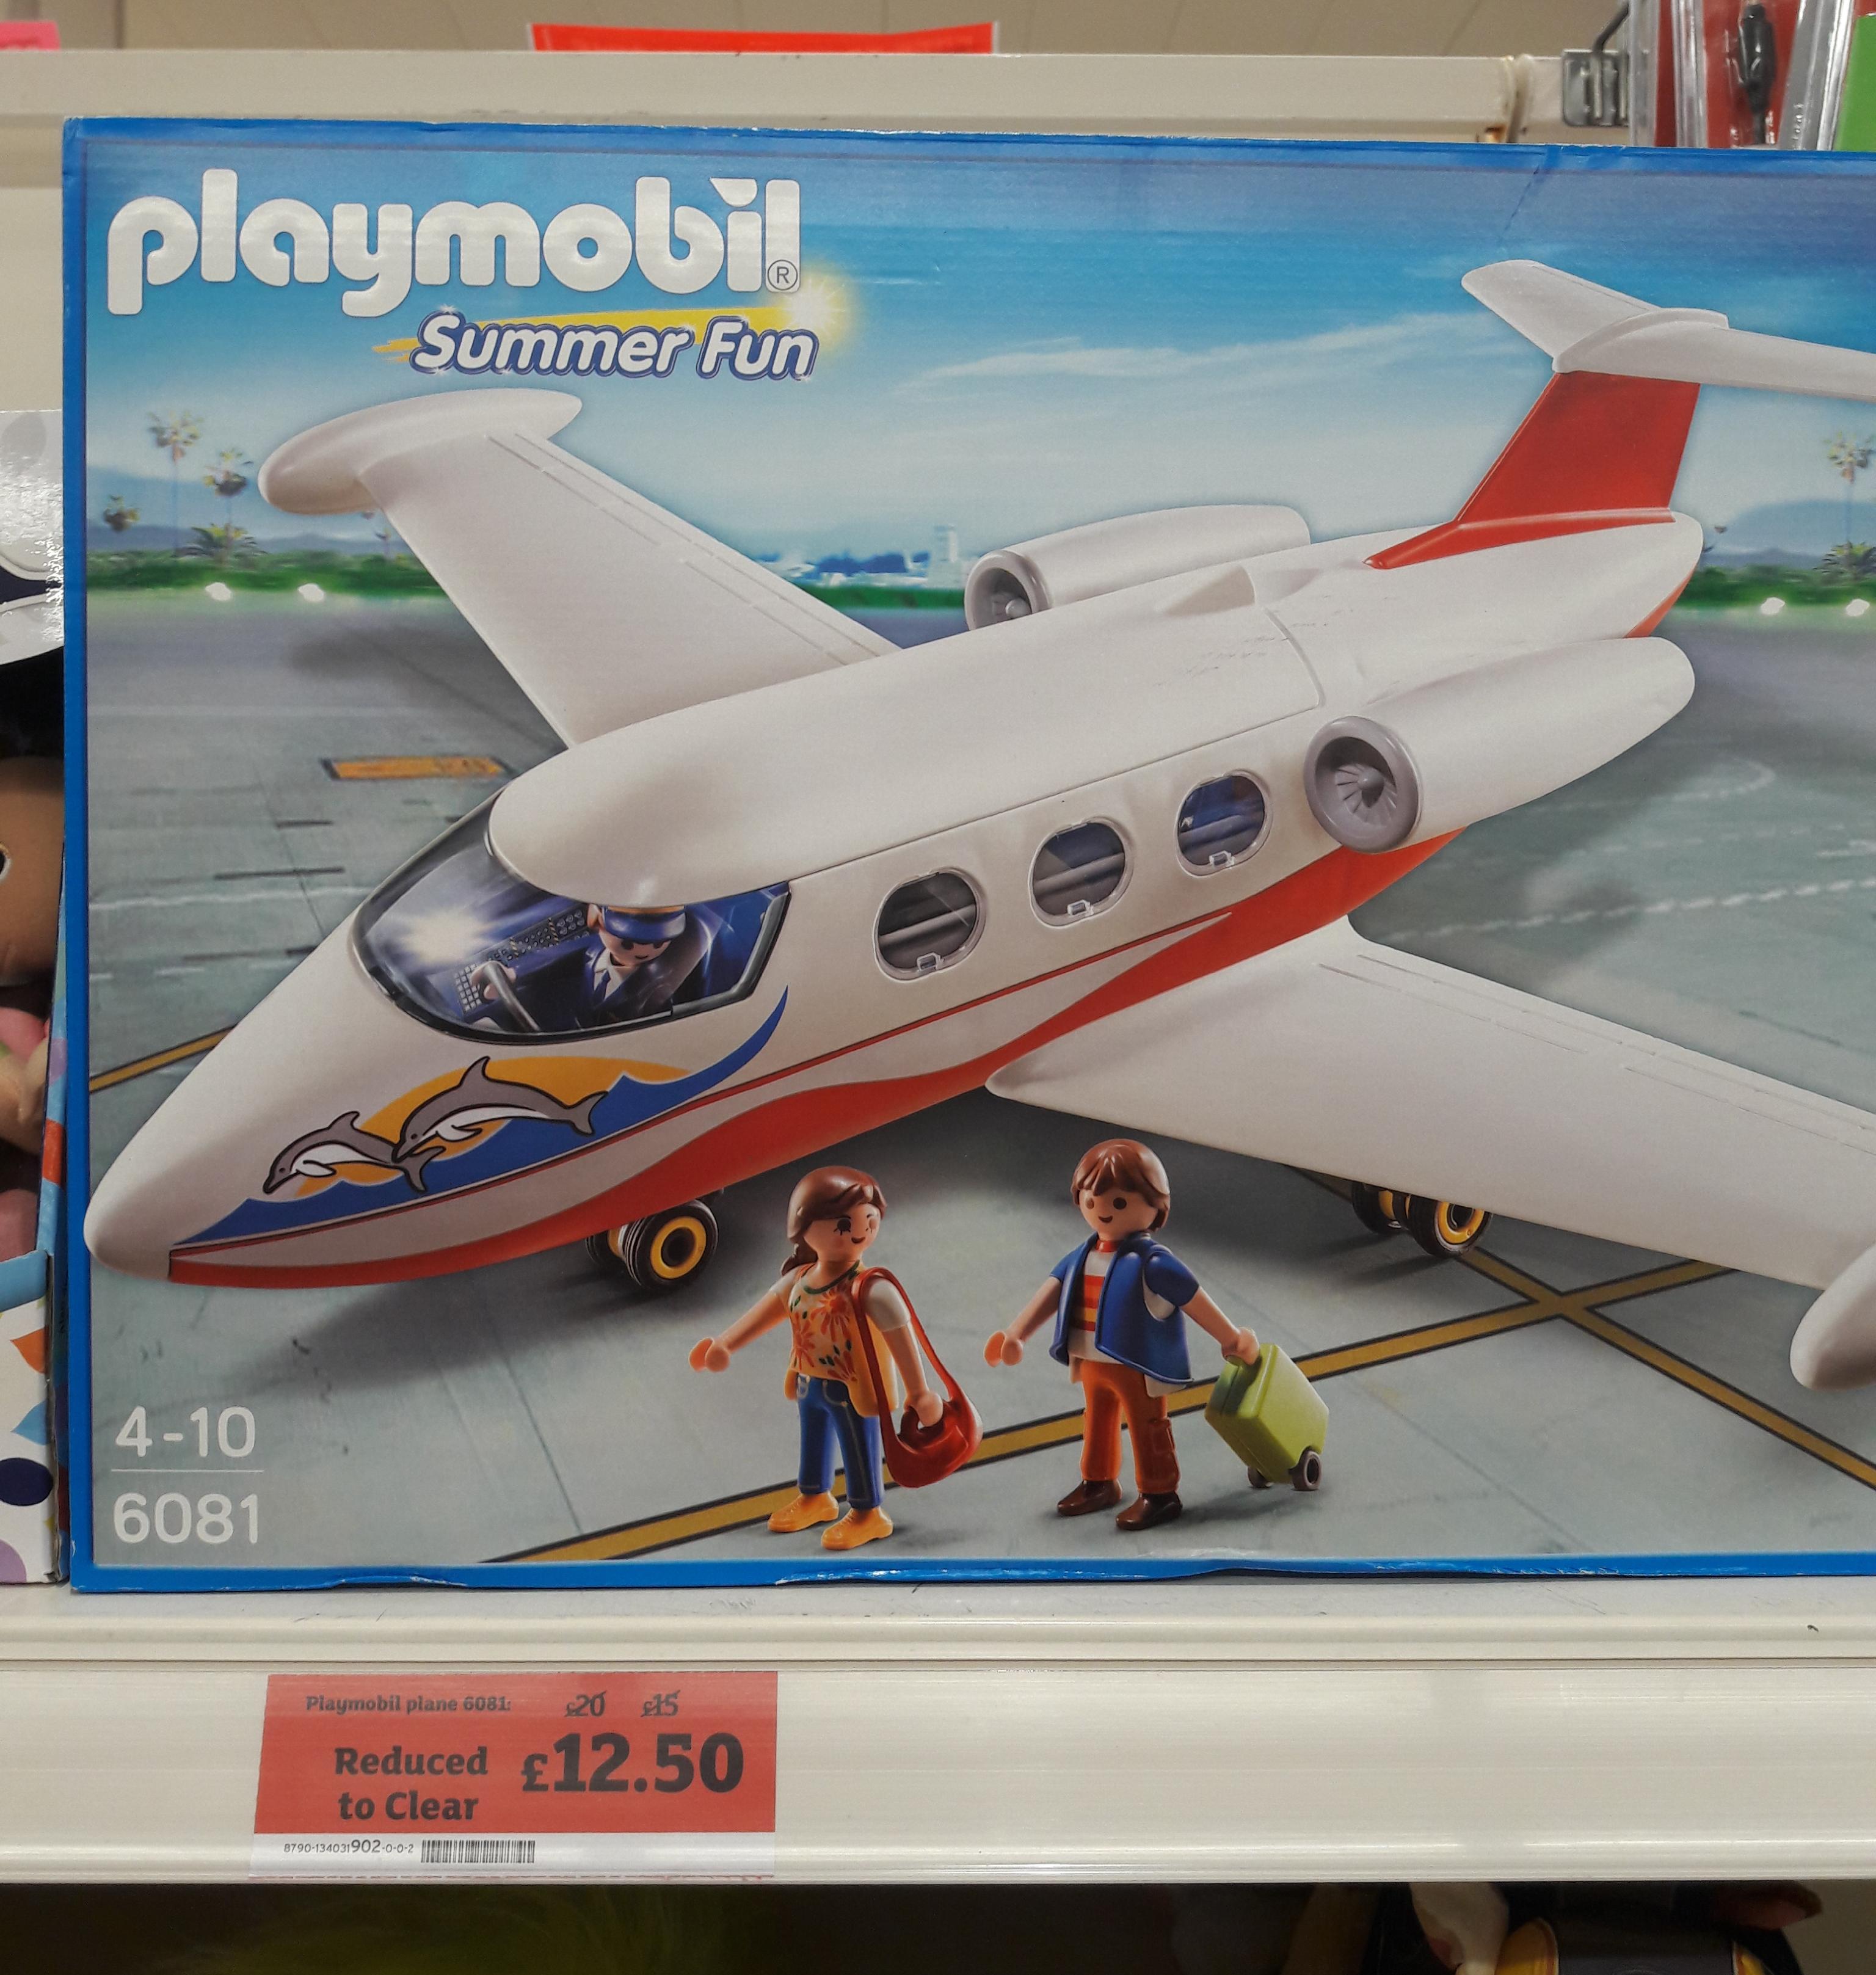 Playmobil 6081 Summer Fun Summer Jet was £20.00 now £12.50 @ Sainsbury's